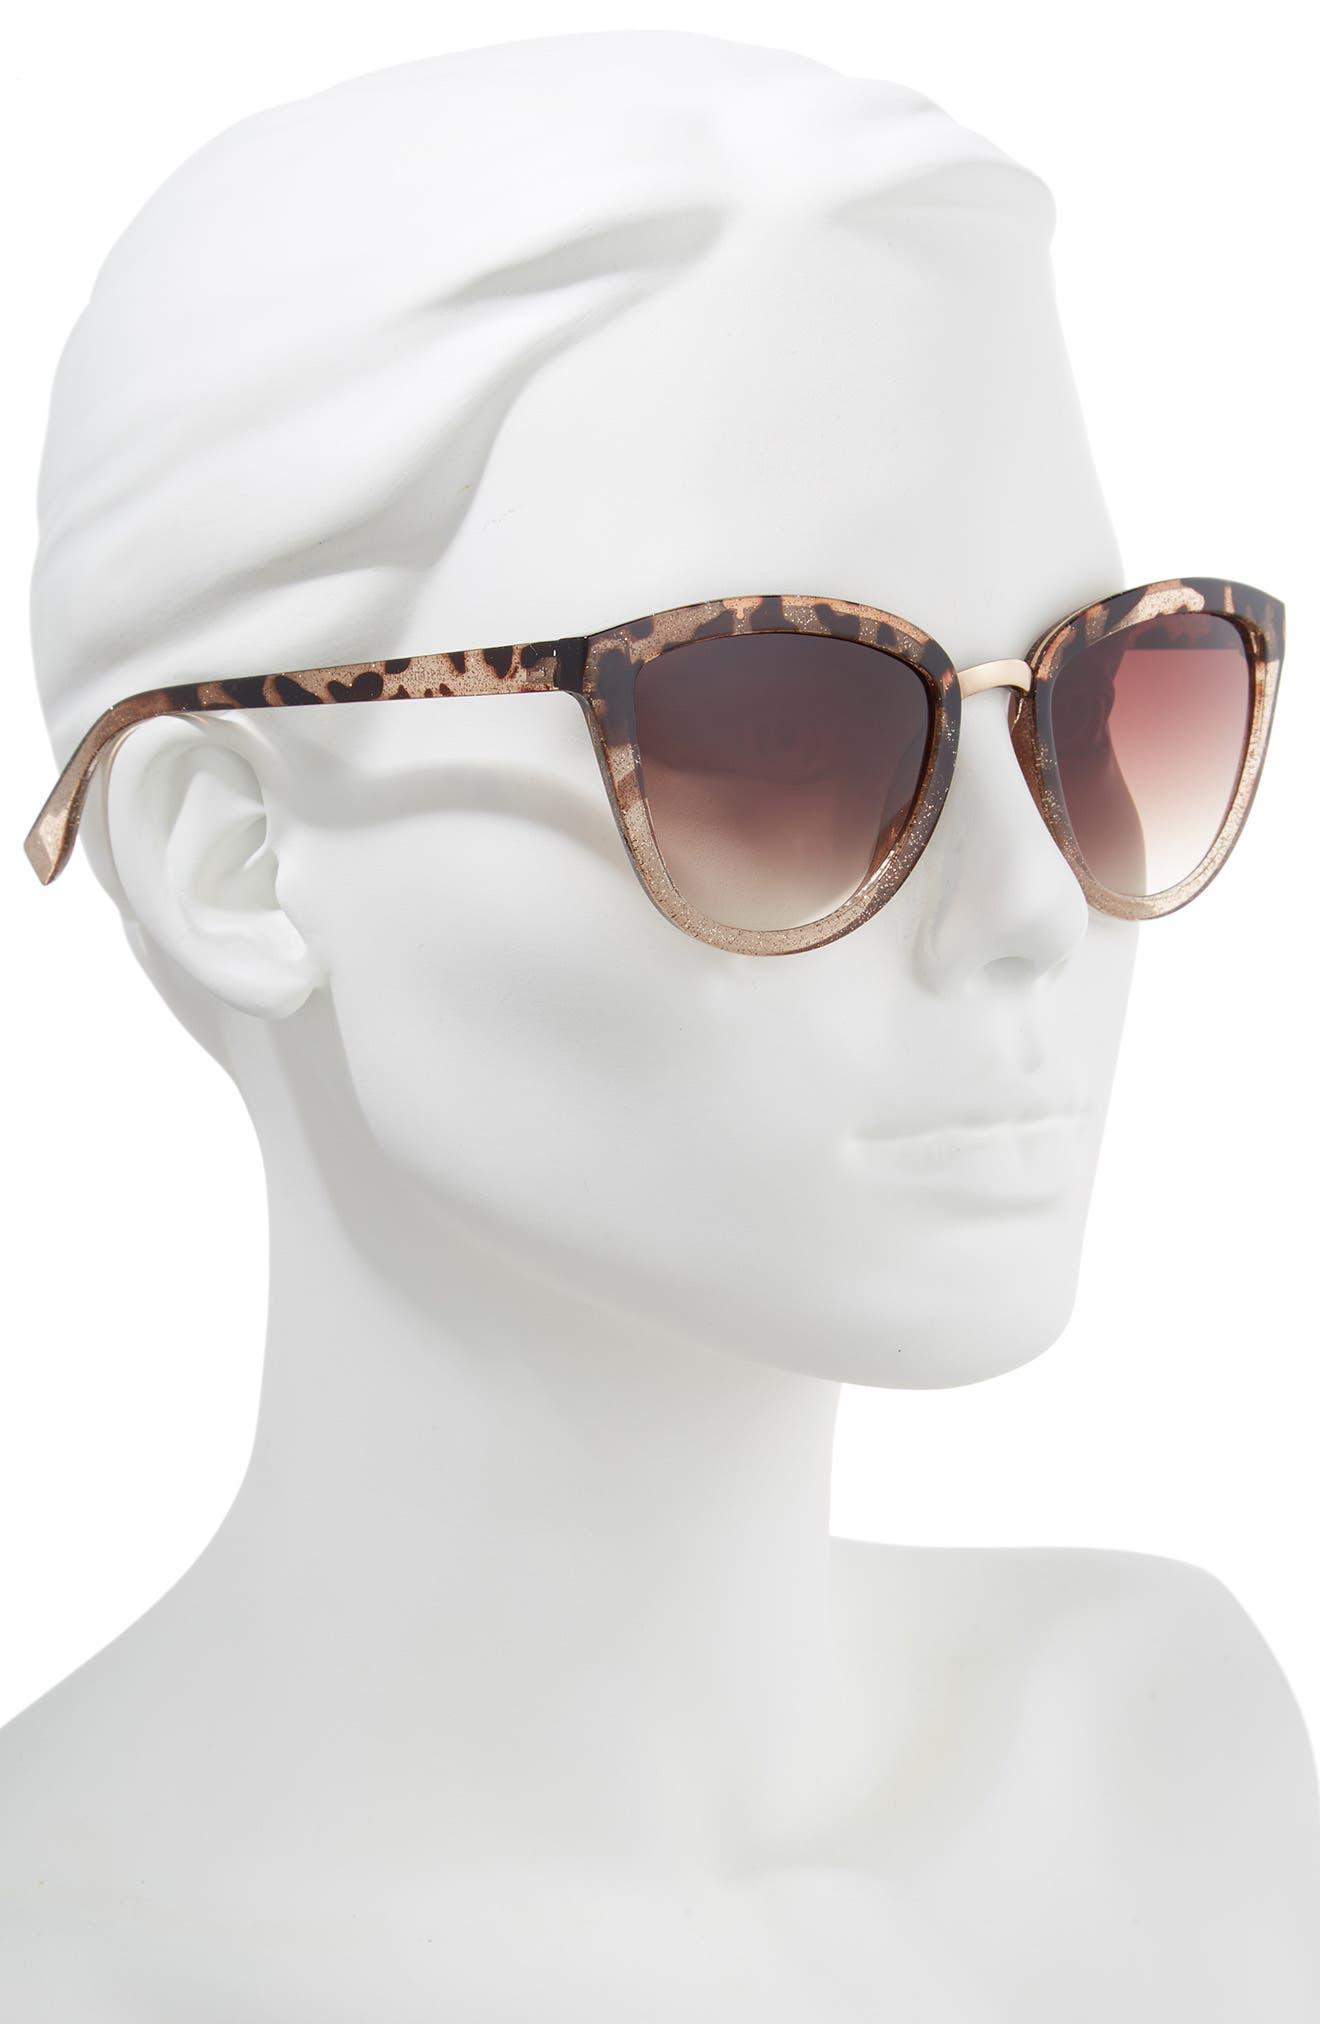 54mm Sparkle Cat Eye Sunglasses,                             Alternate thumbnail 2, color,                             200